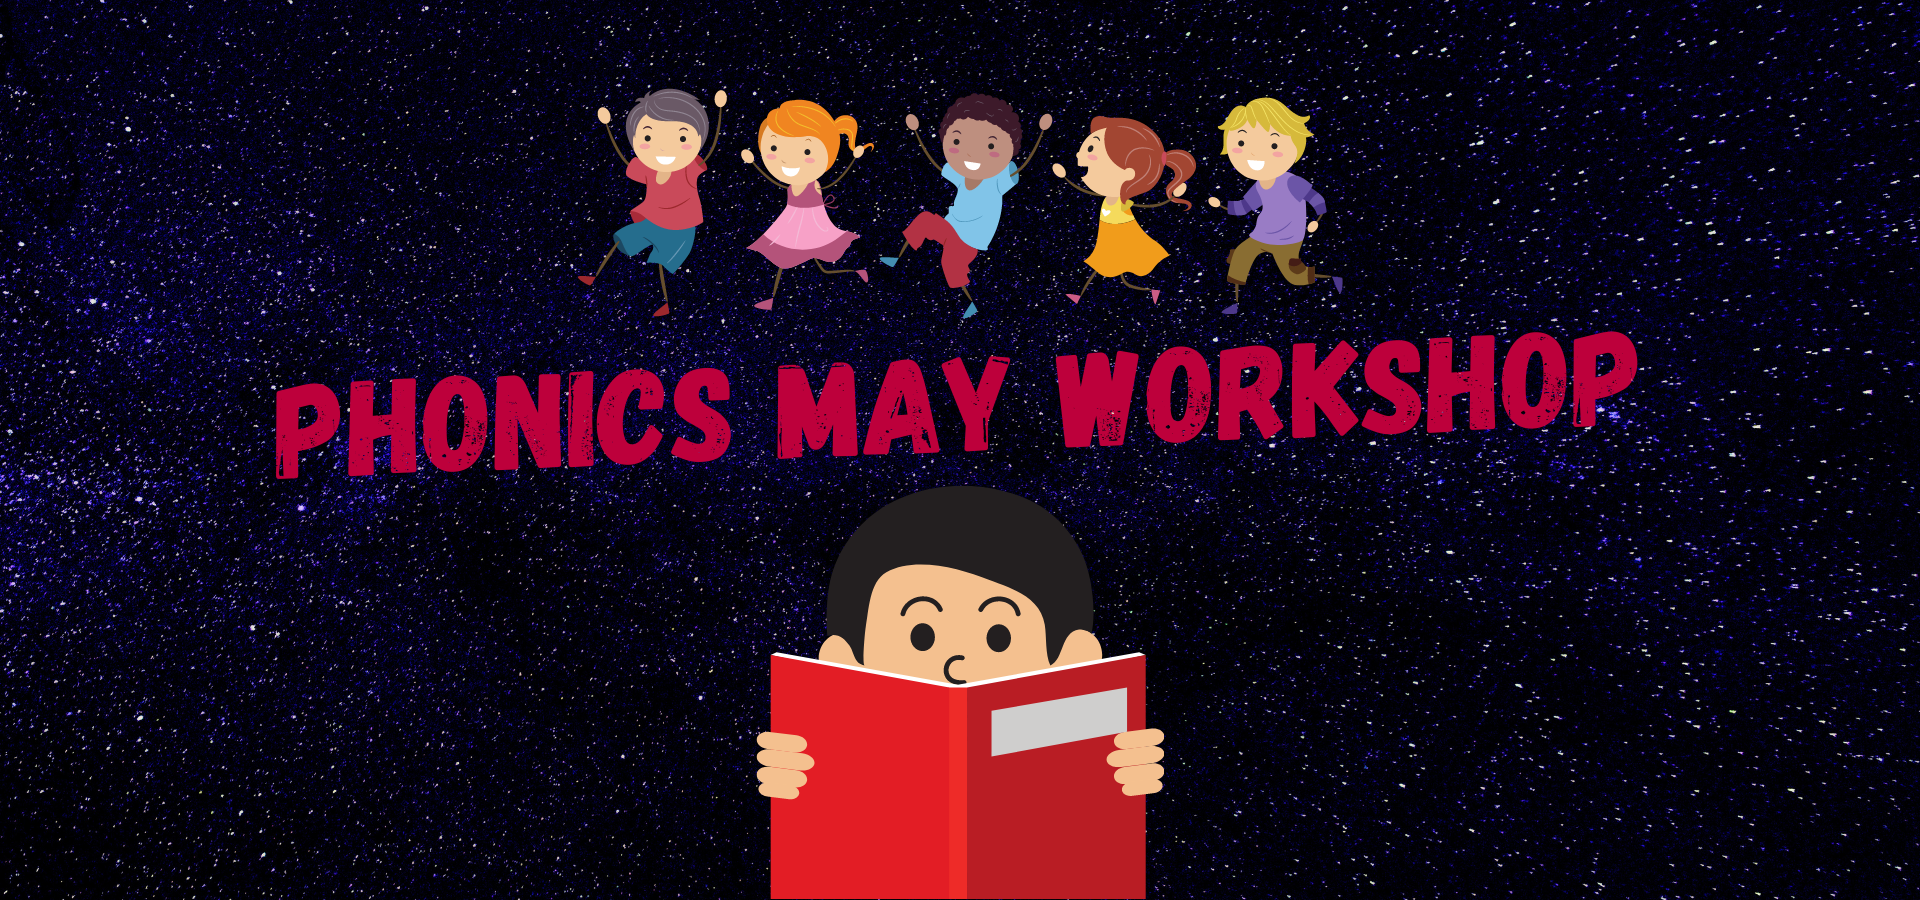 Phonics Showcase May Workshop